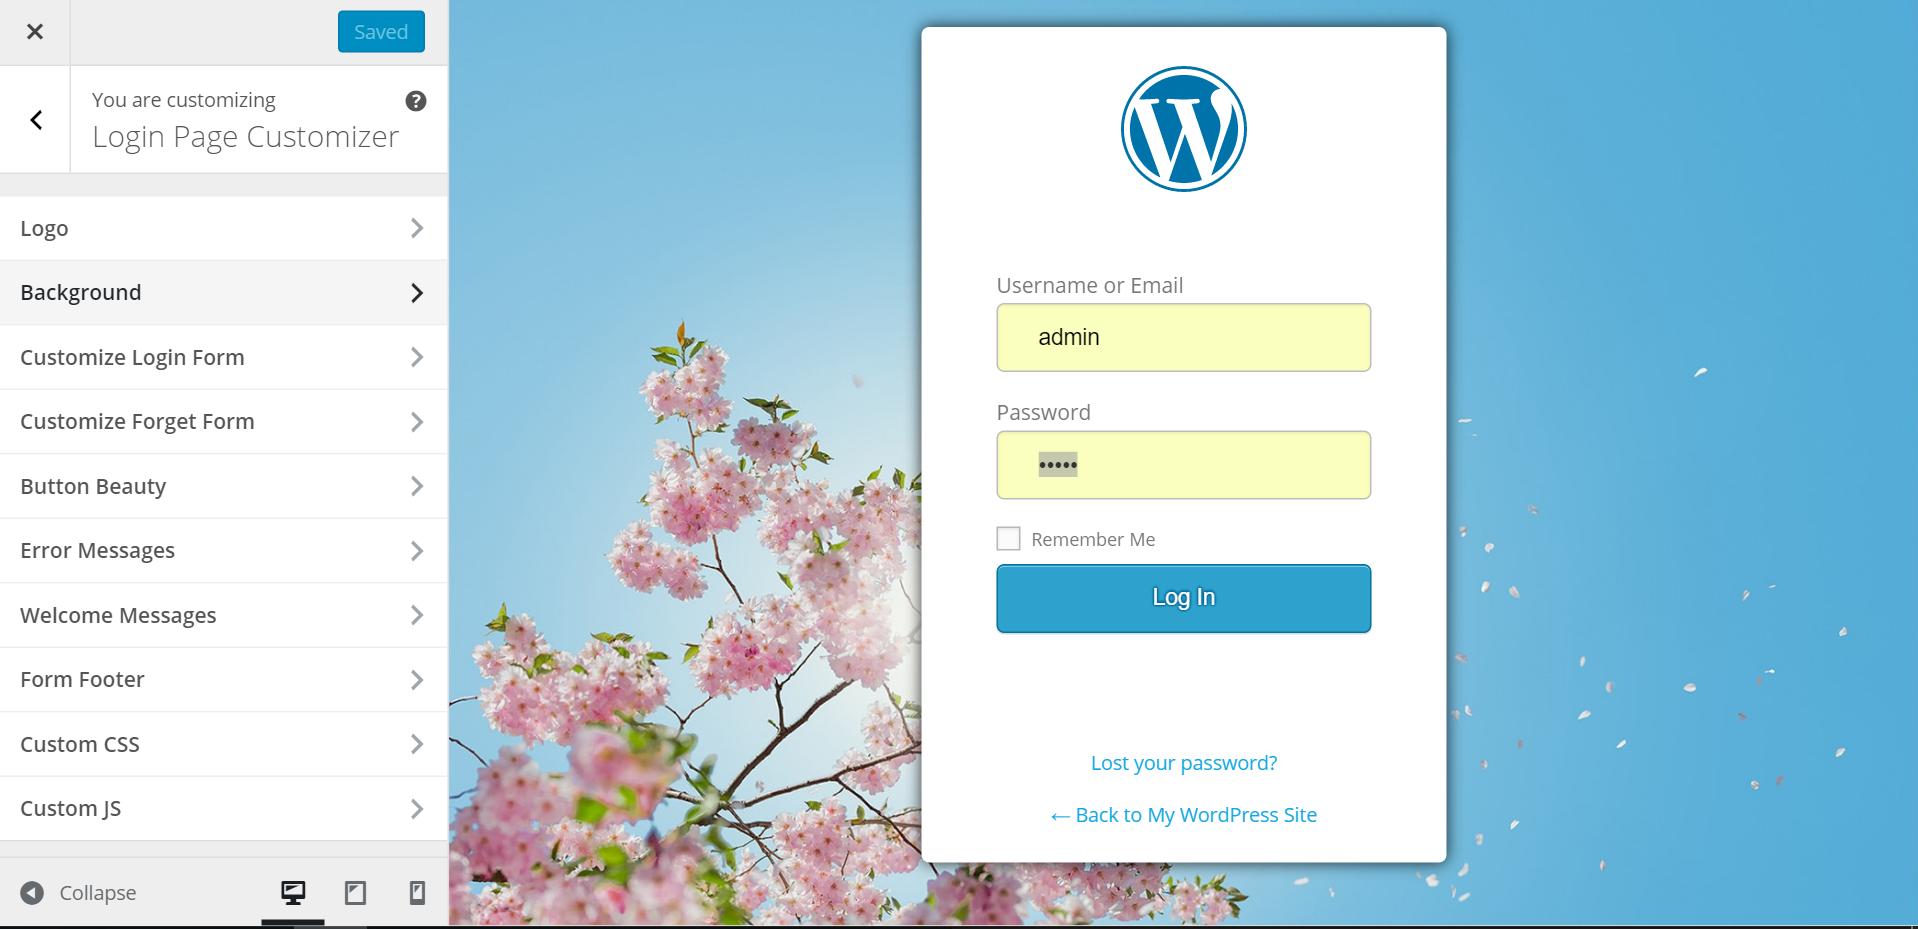 Custom Login Page Customizer | LoginPress Download Free Wordpress Plugin 2